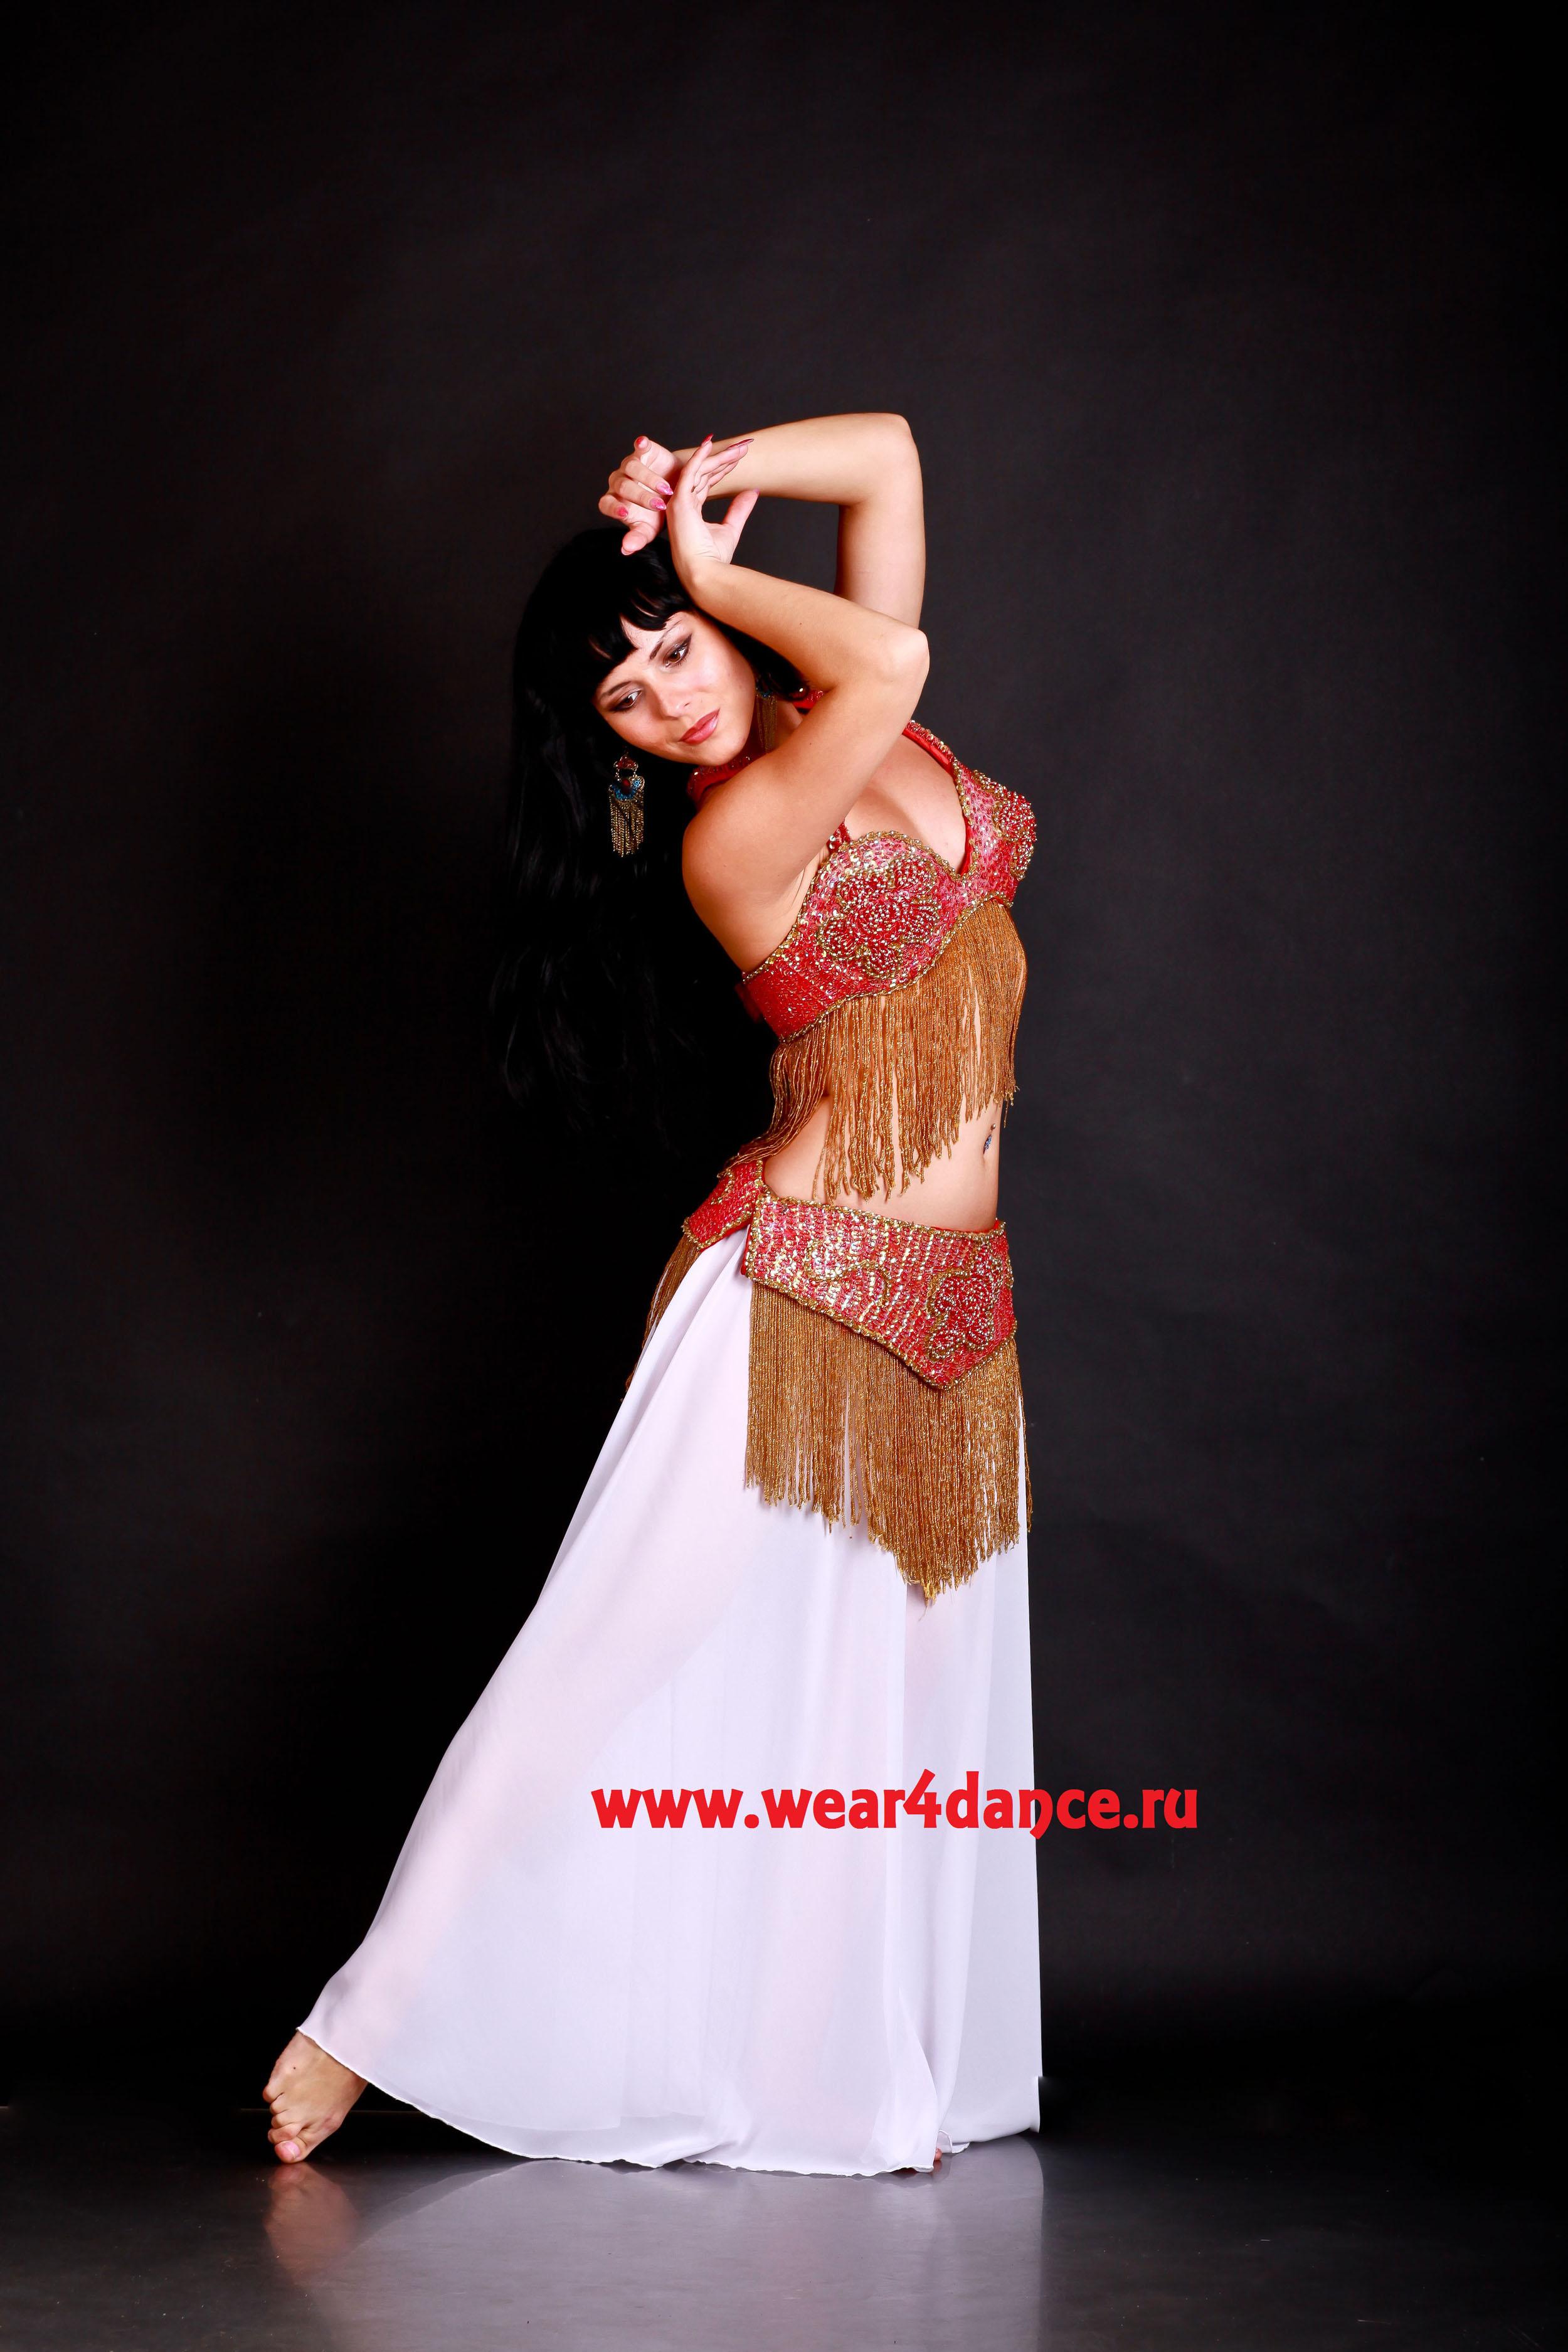 Юбке танцует стриптиз 4 фотография